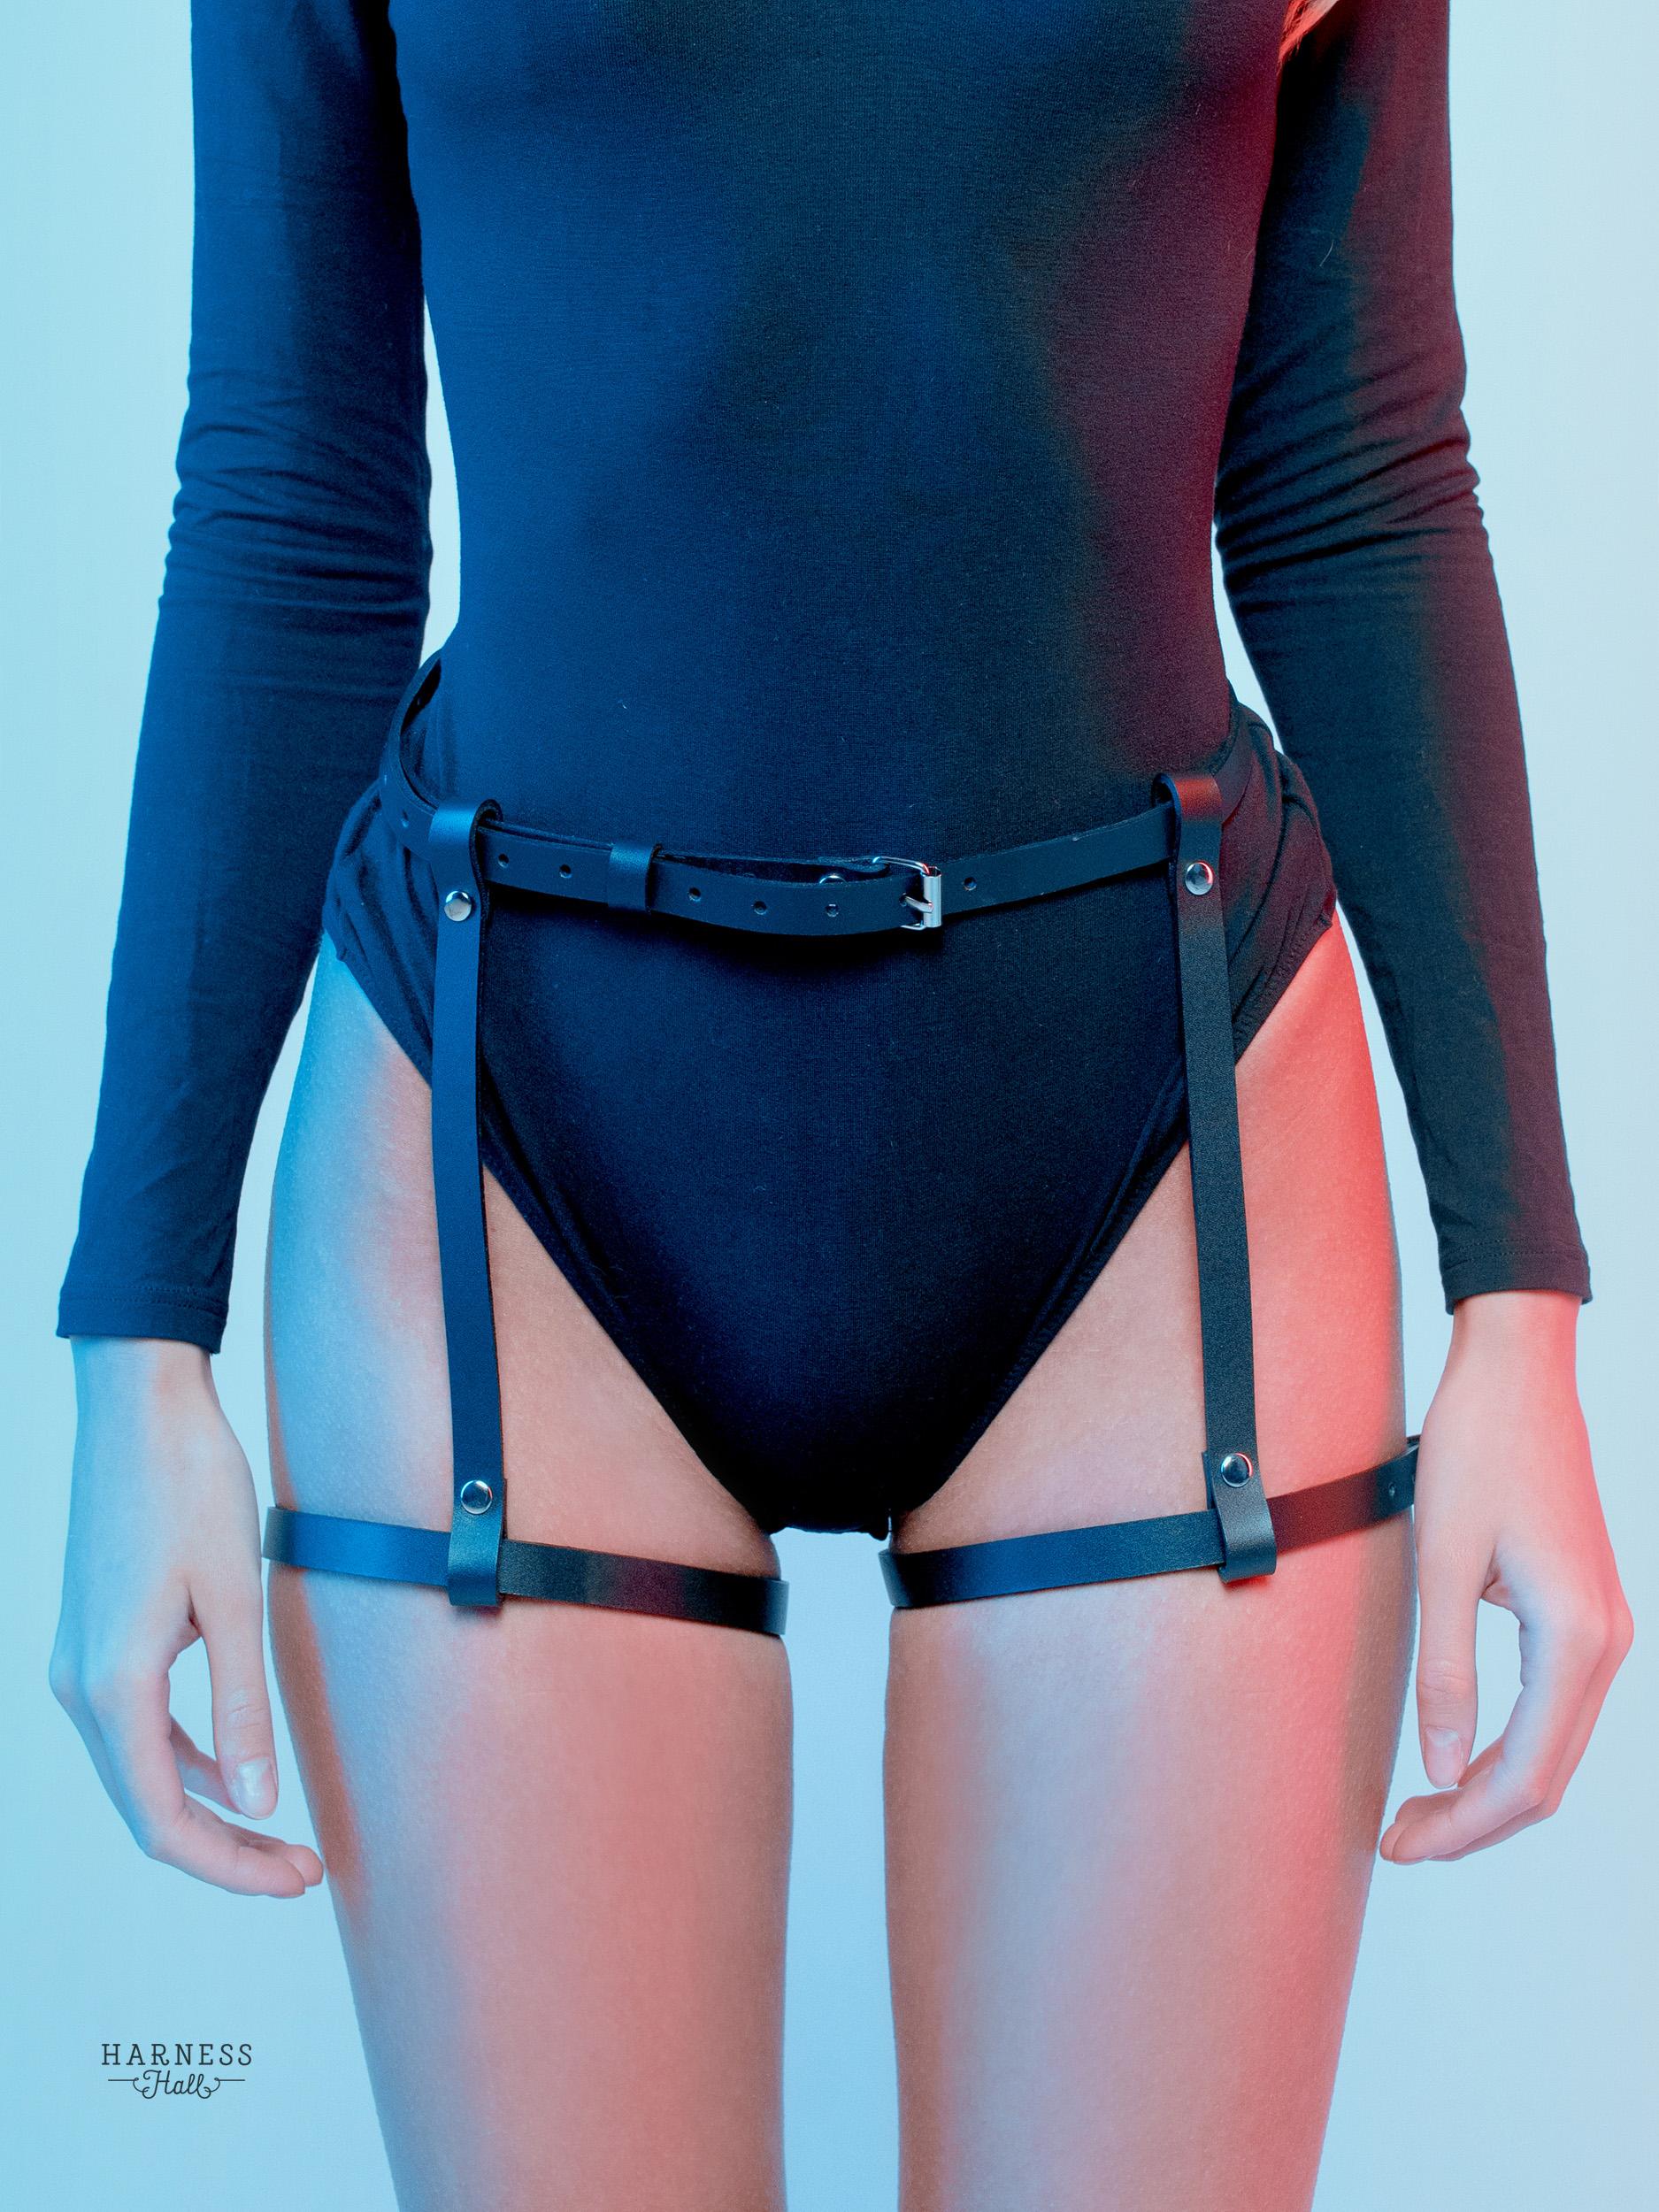 Women Leather Harness Garter Belt Body Sexy Leg Straps Cage Goth BDSM Suspenders